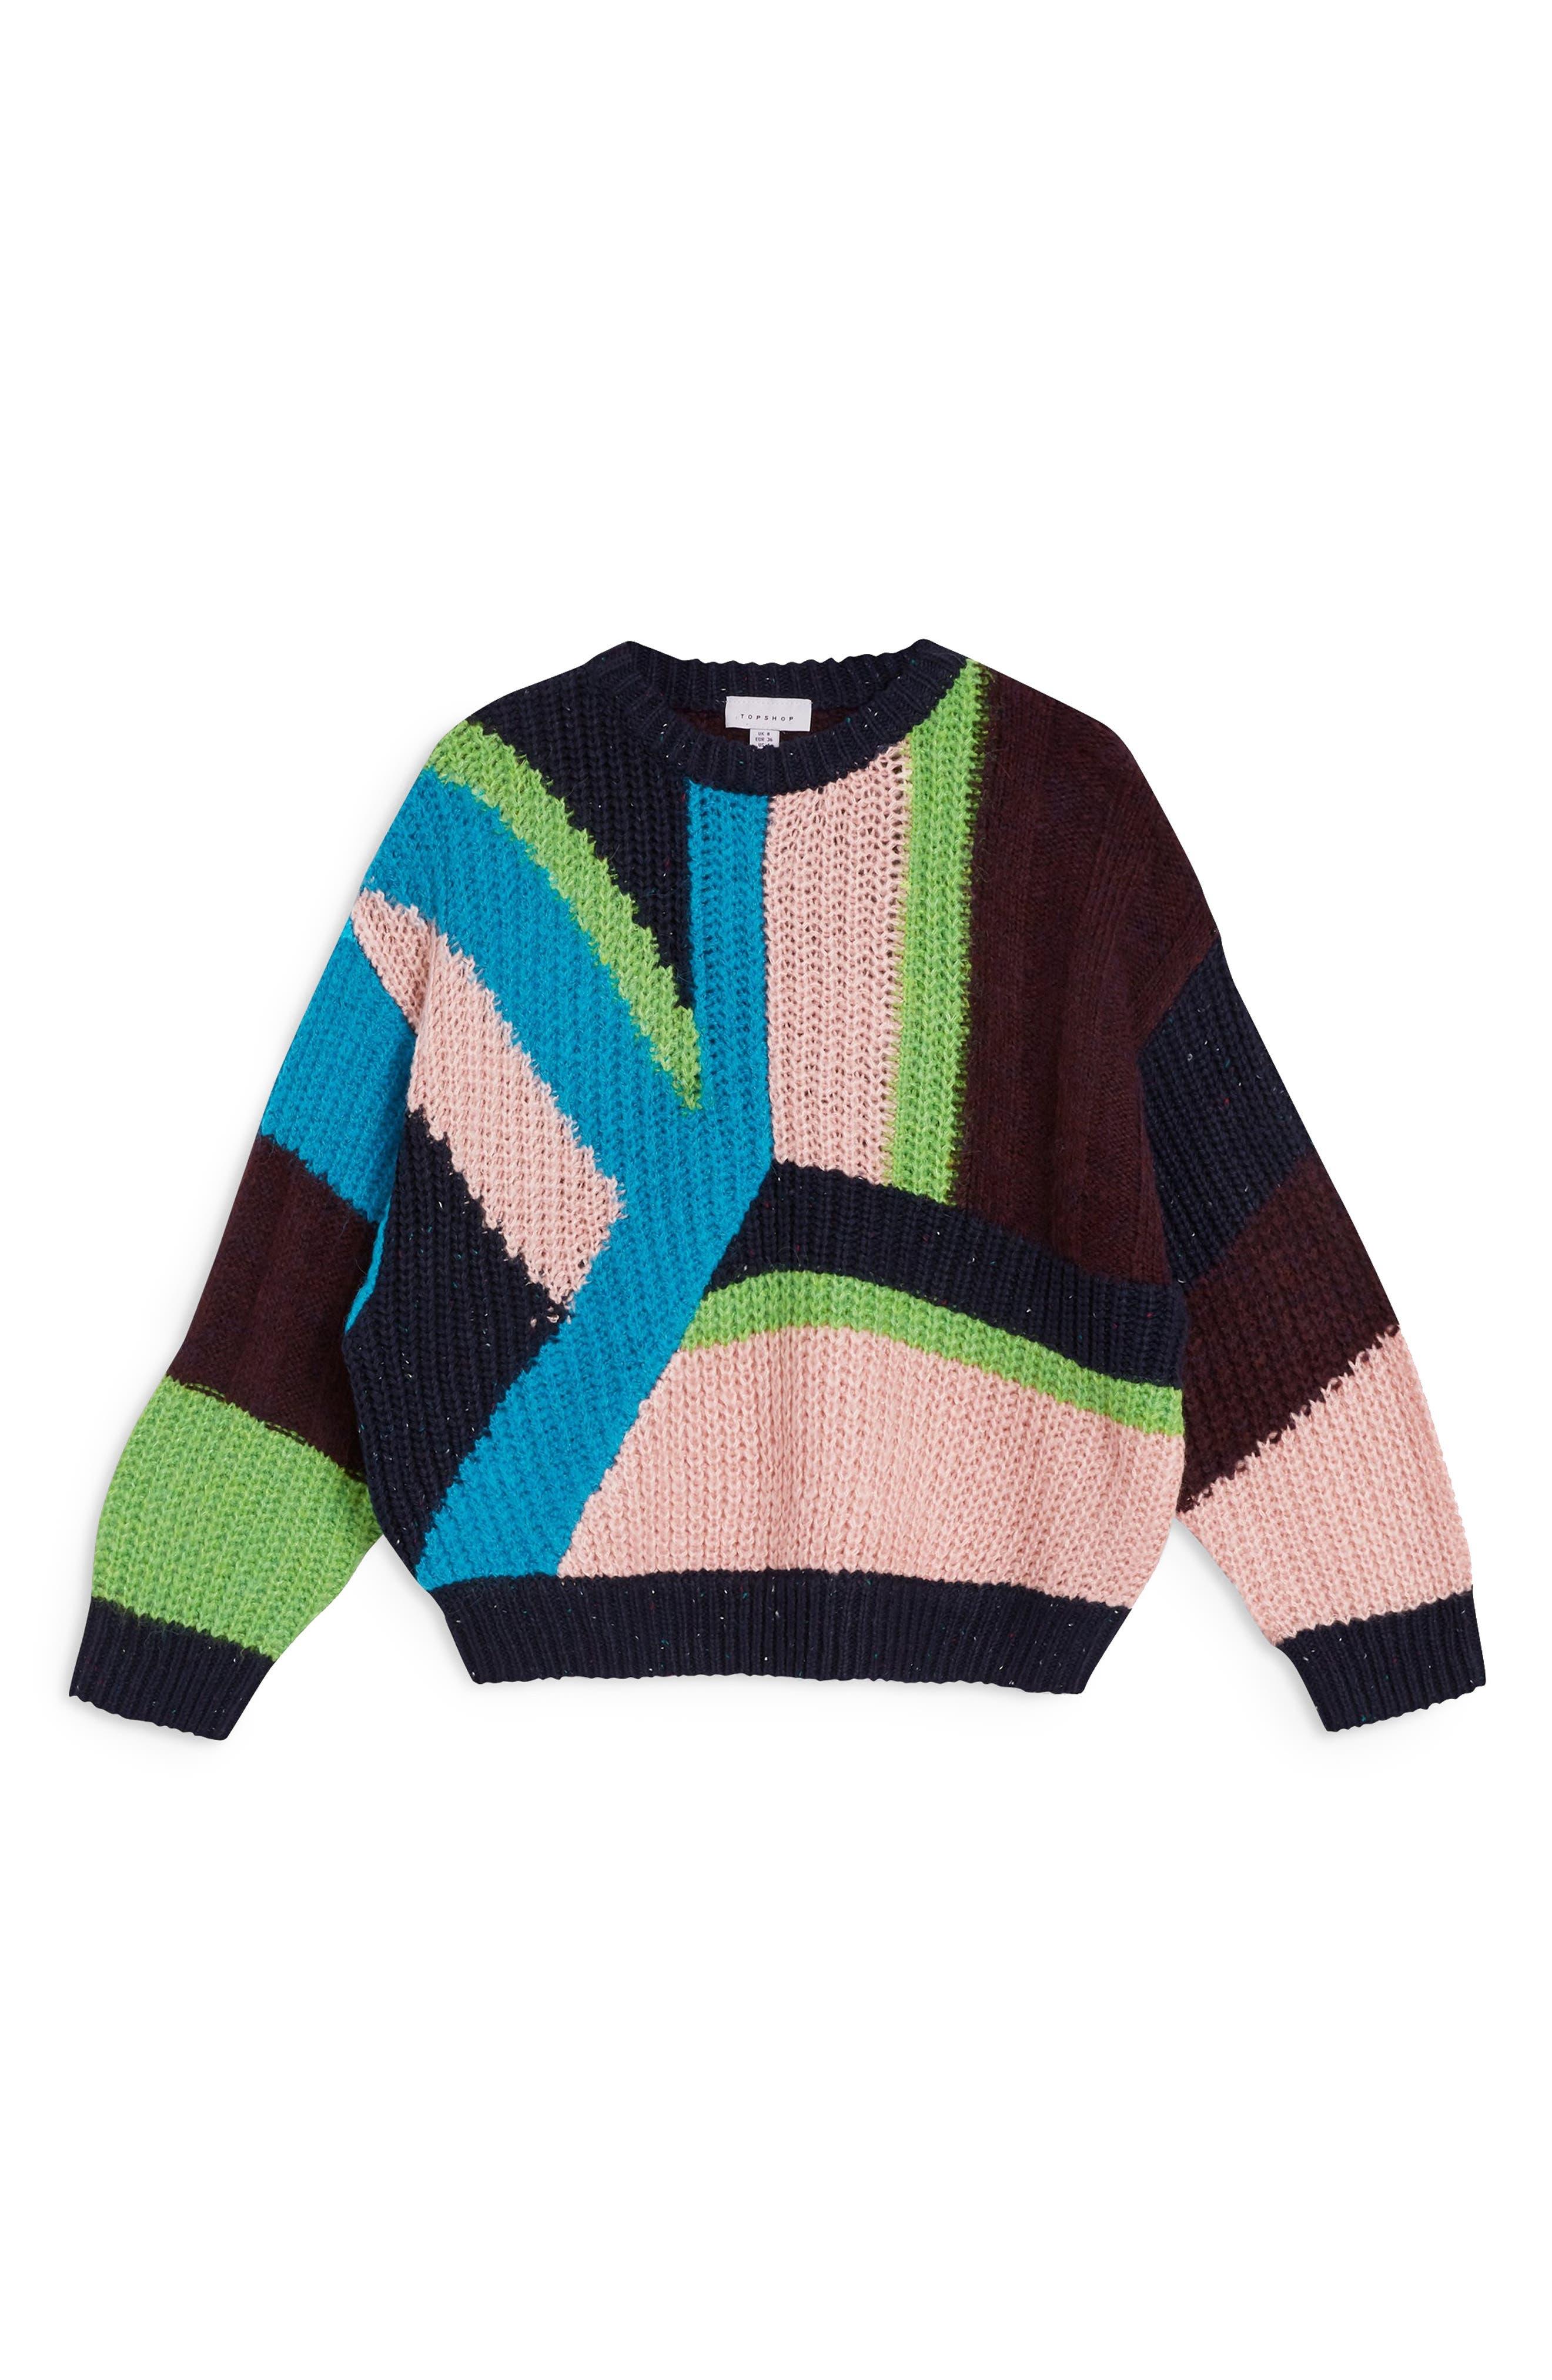 TOPSHOP,                             Colorblock Sweater,                             Alternate thumbnail 3, color,                             002